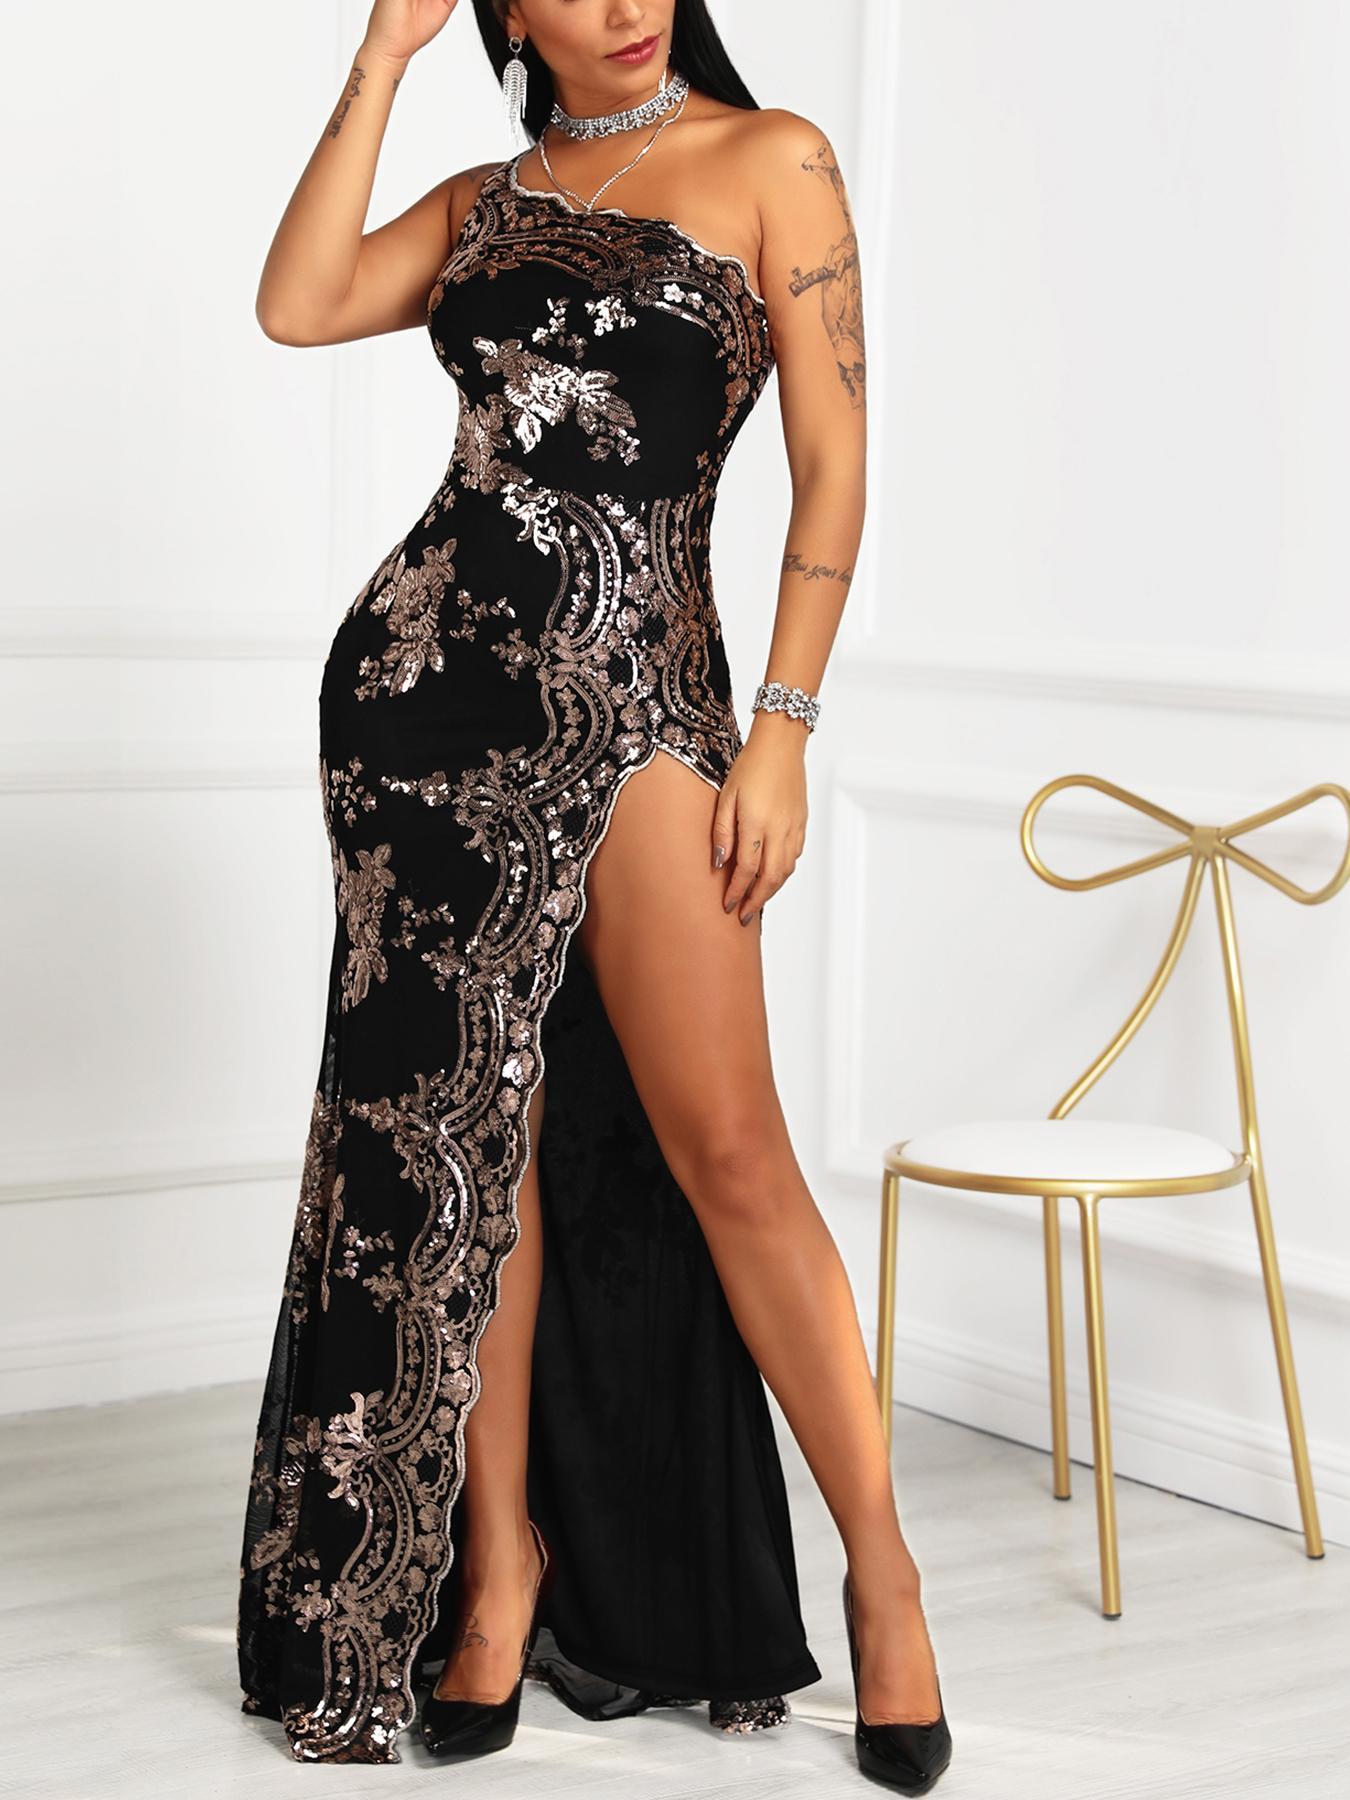 chicme / One Shoulder High Slit Sequin Party Dress